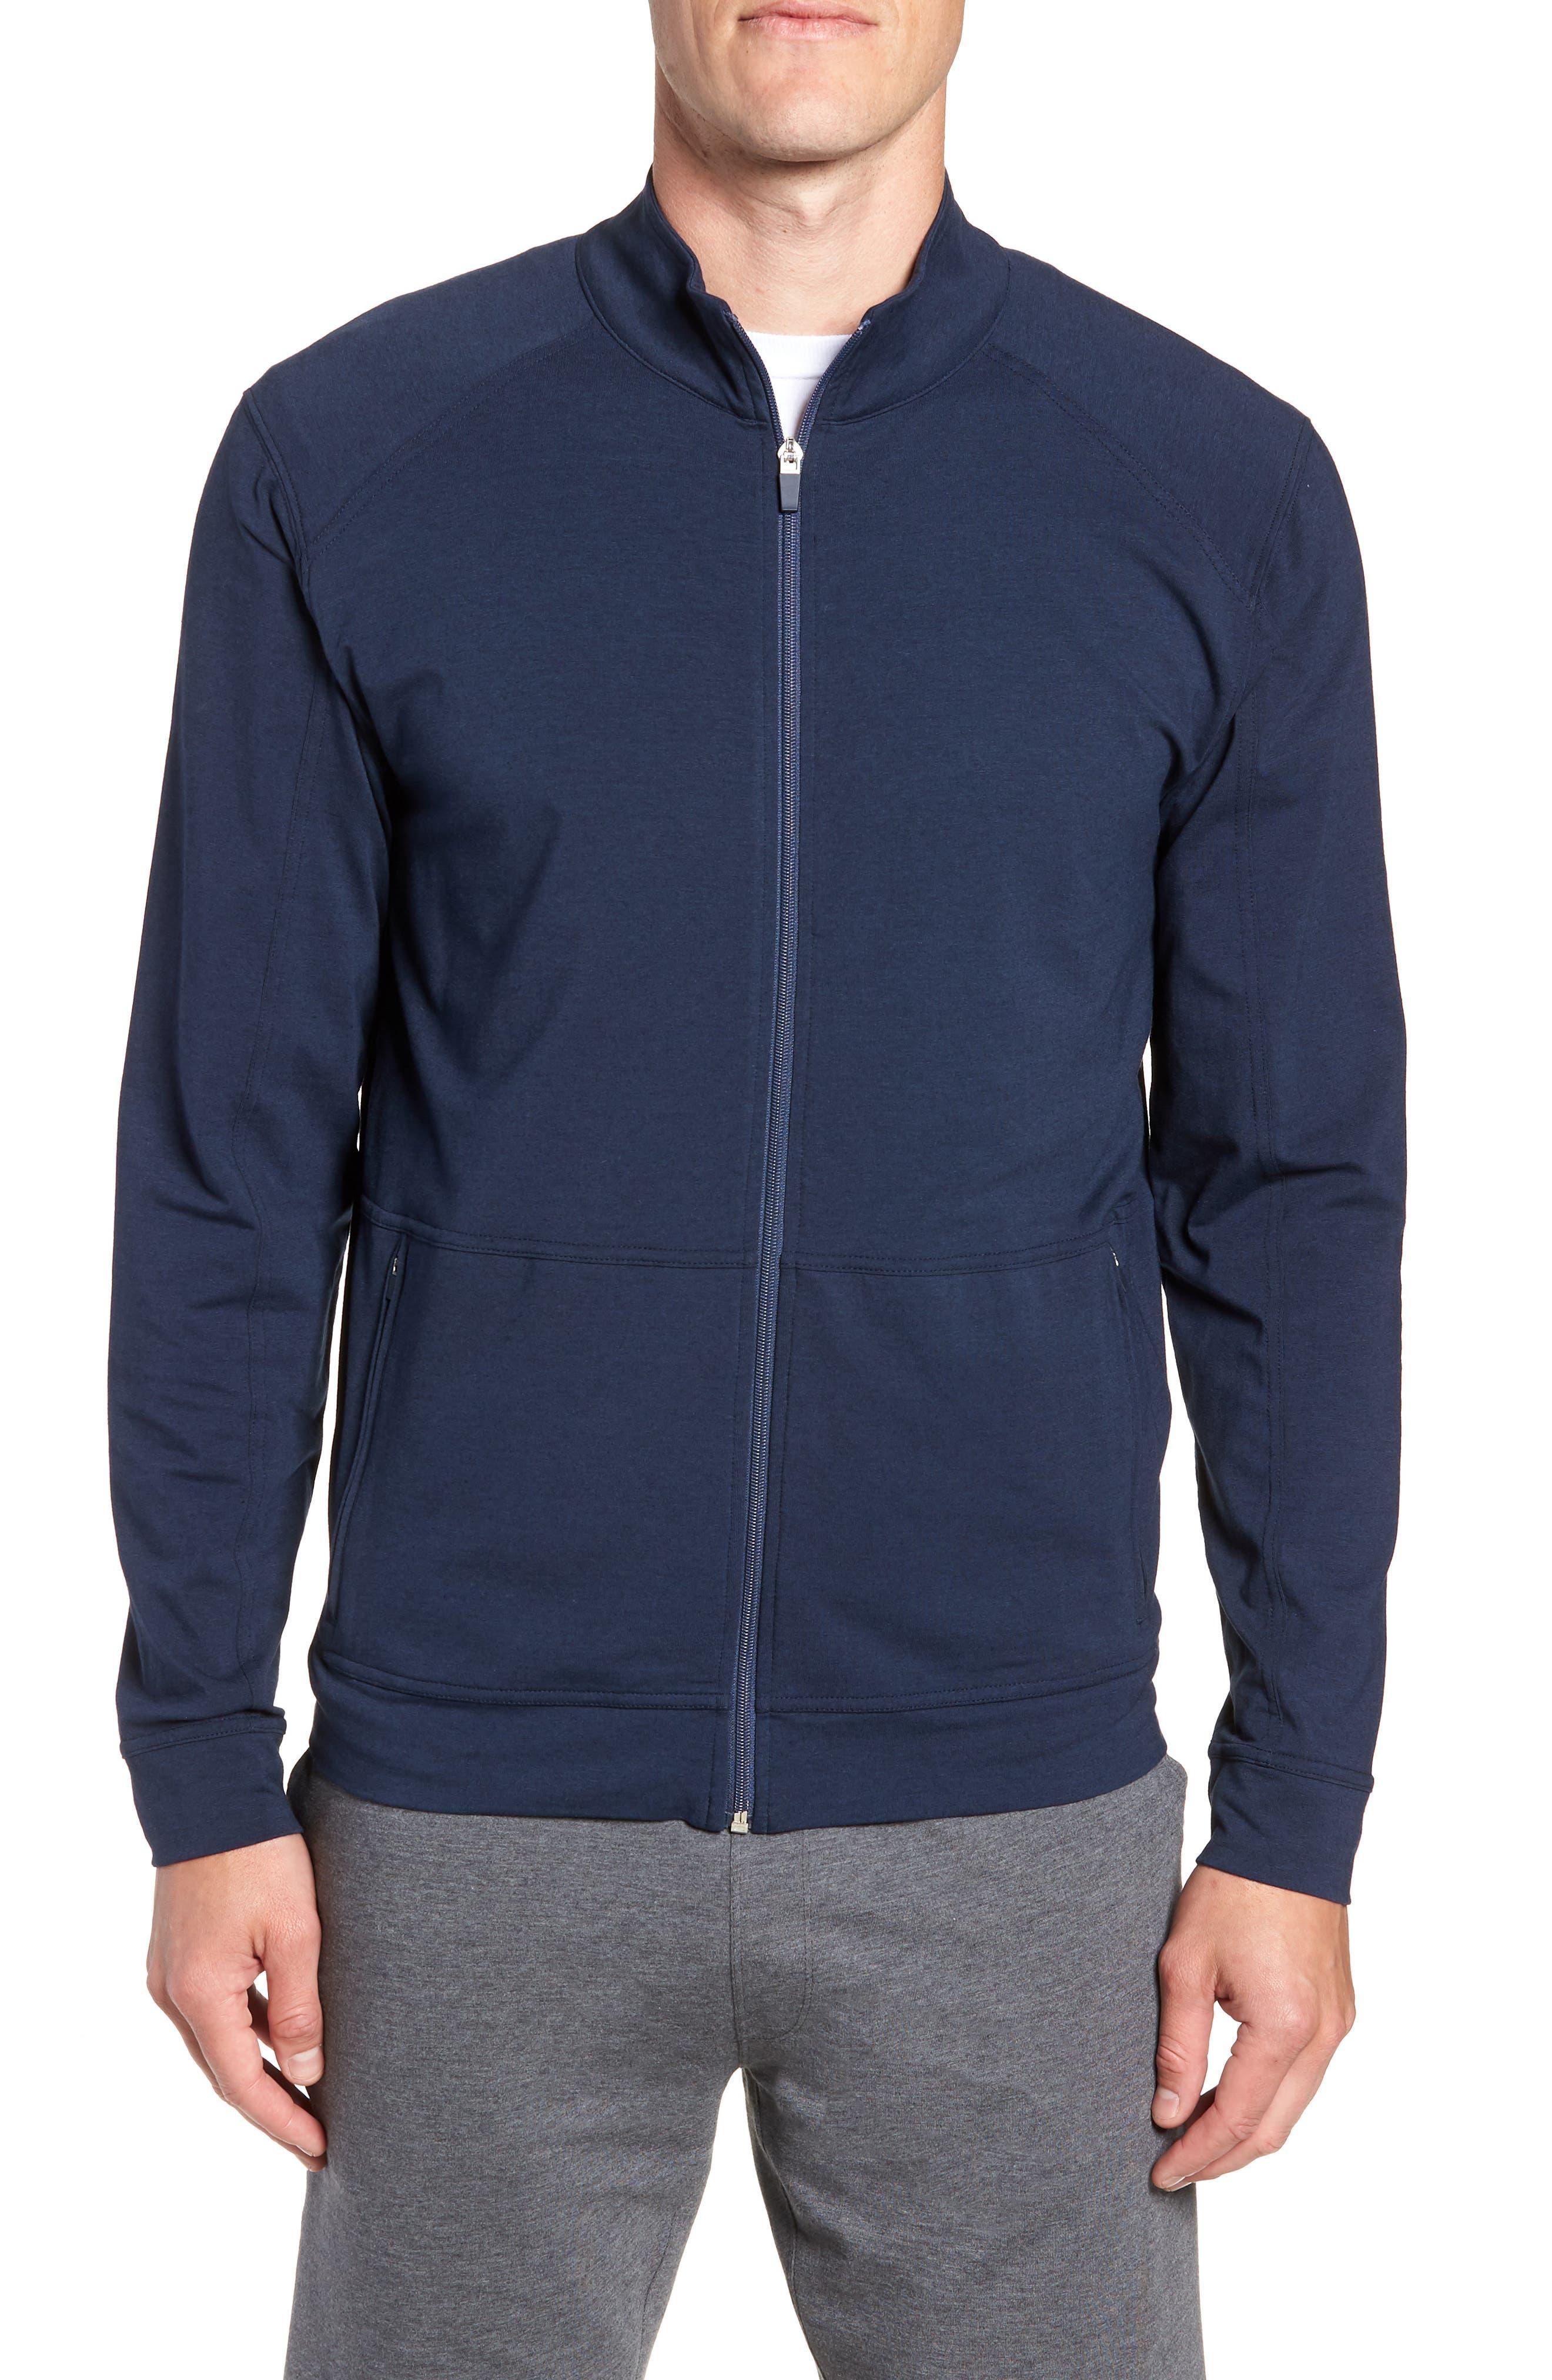 TASC PERFORMANCE,                             Carrollton Zip Jacket,                             Main thumbnail 1, color,                             CLASSIC NAVY